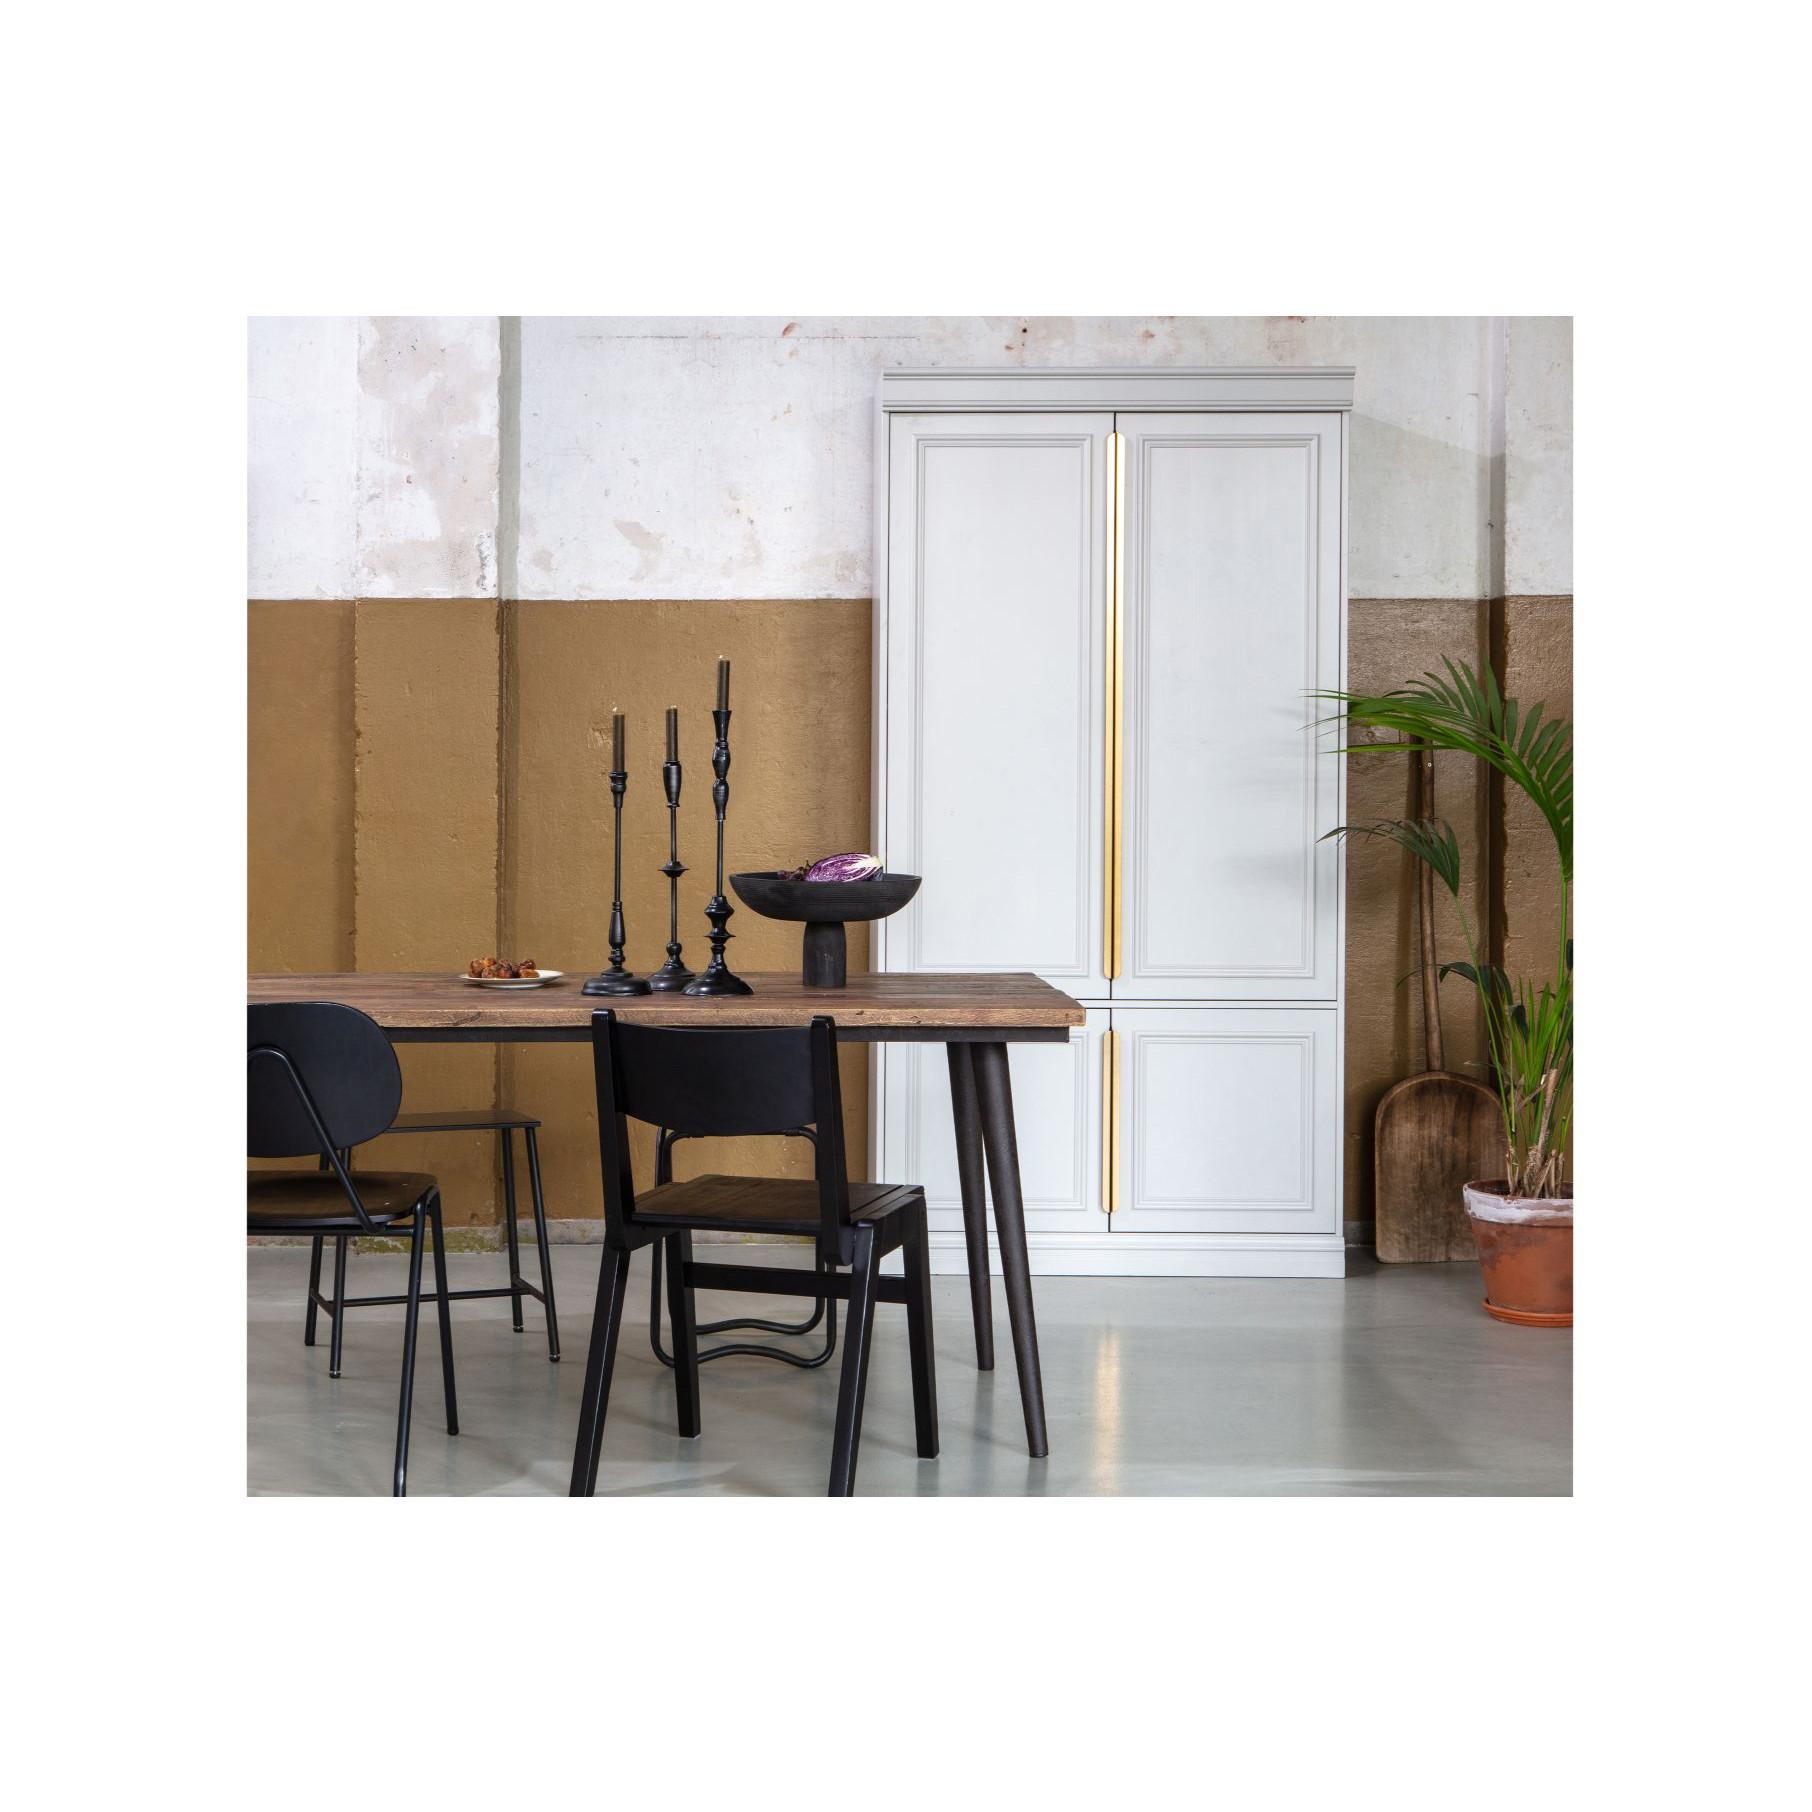 Tischgilde